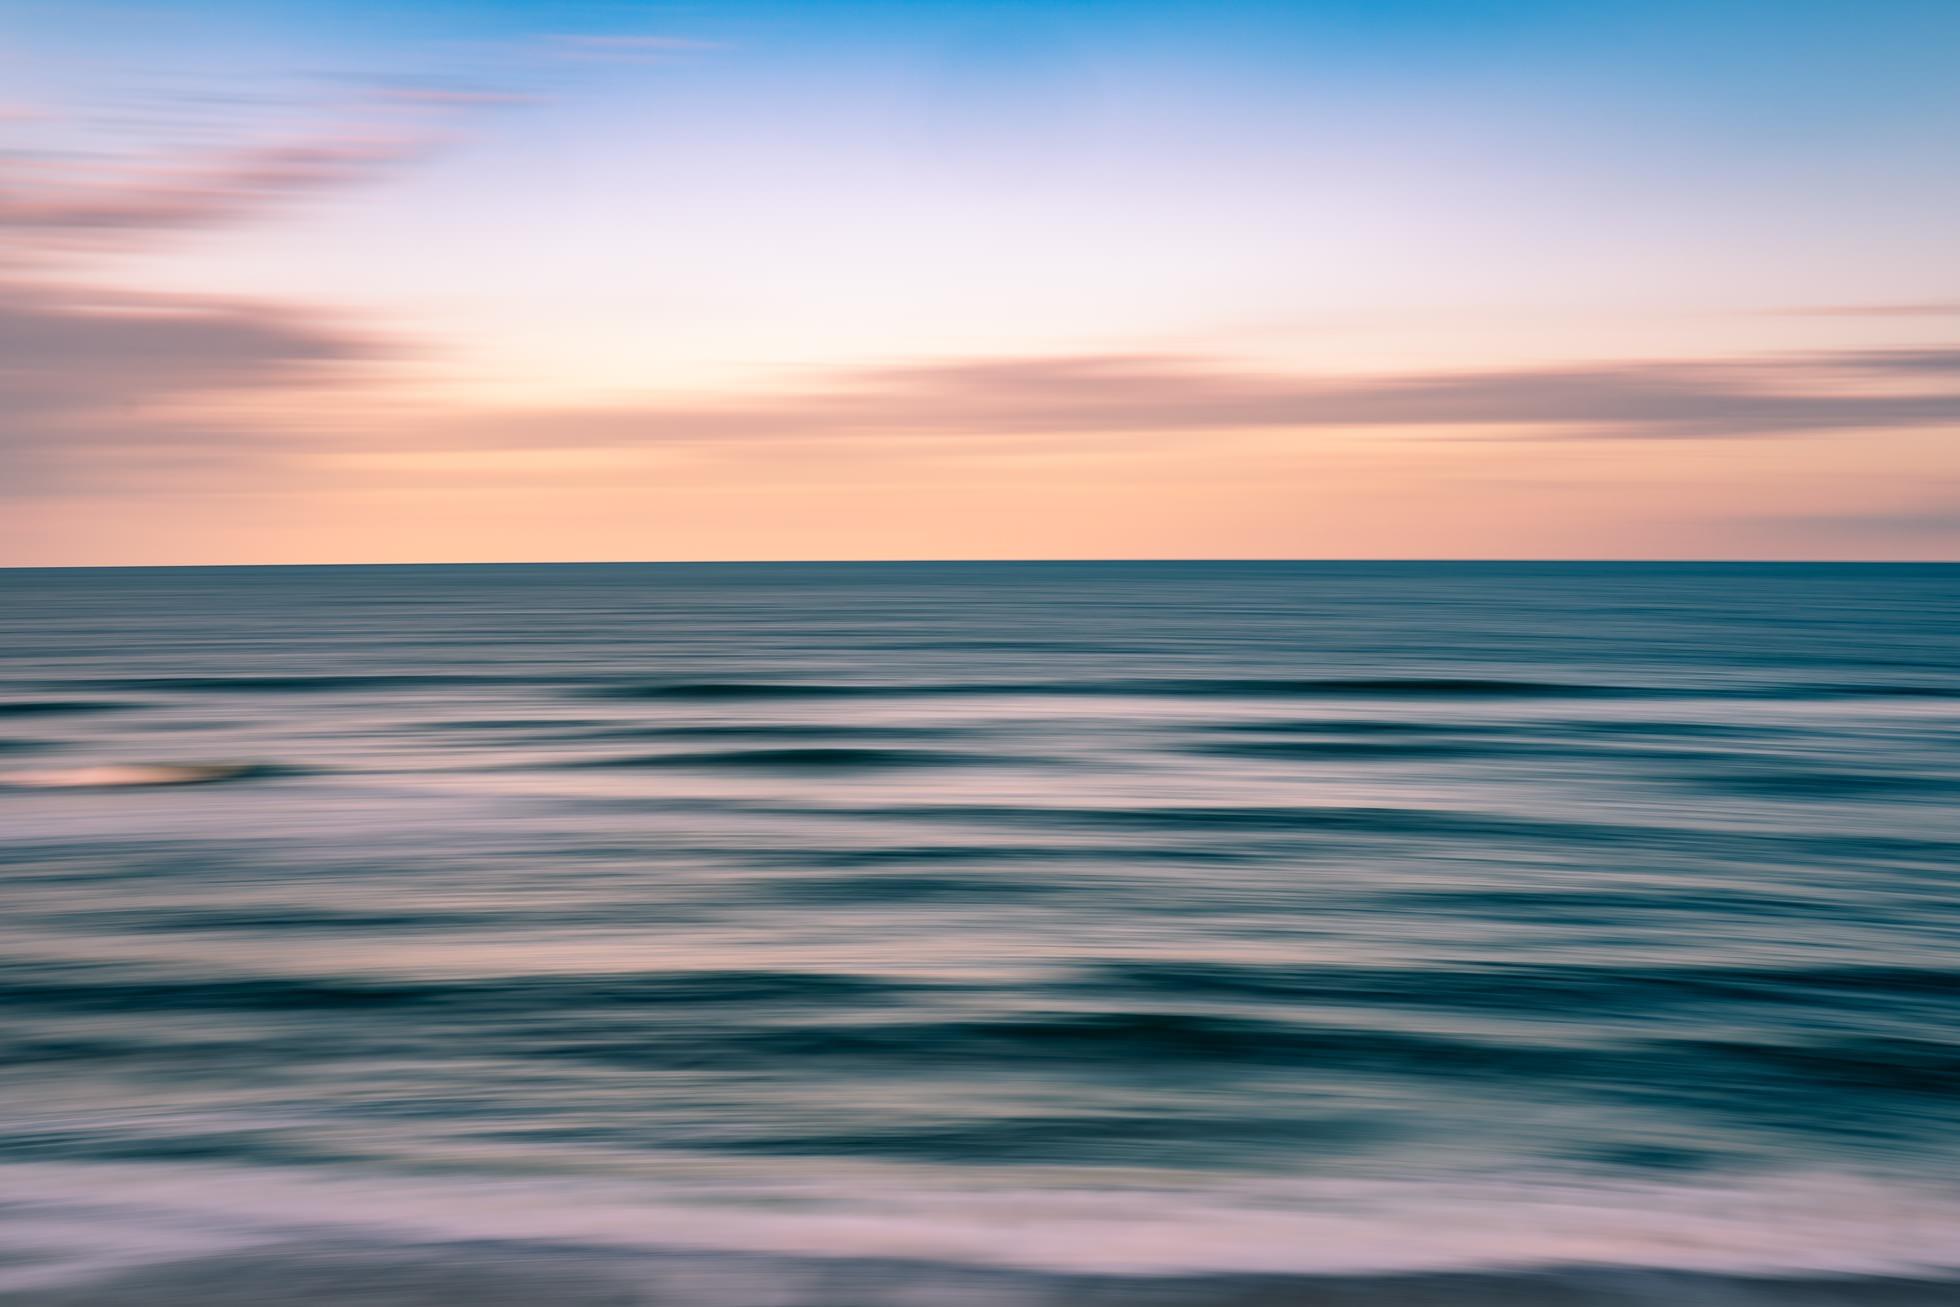 jennifer carr photography saltwater retreat for women hatteras north carolina